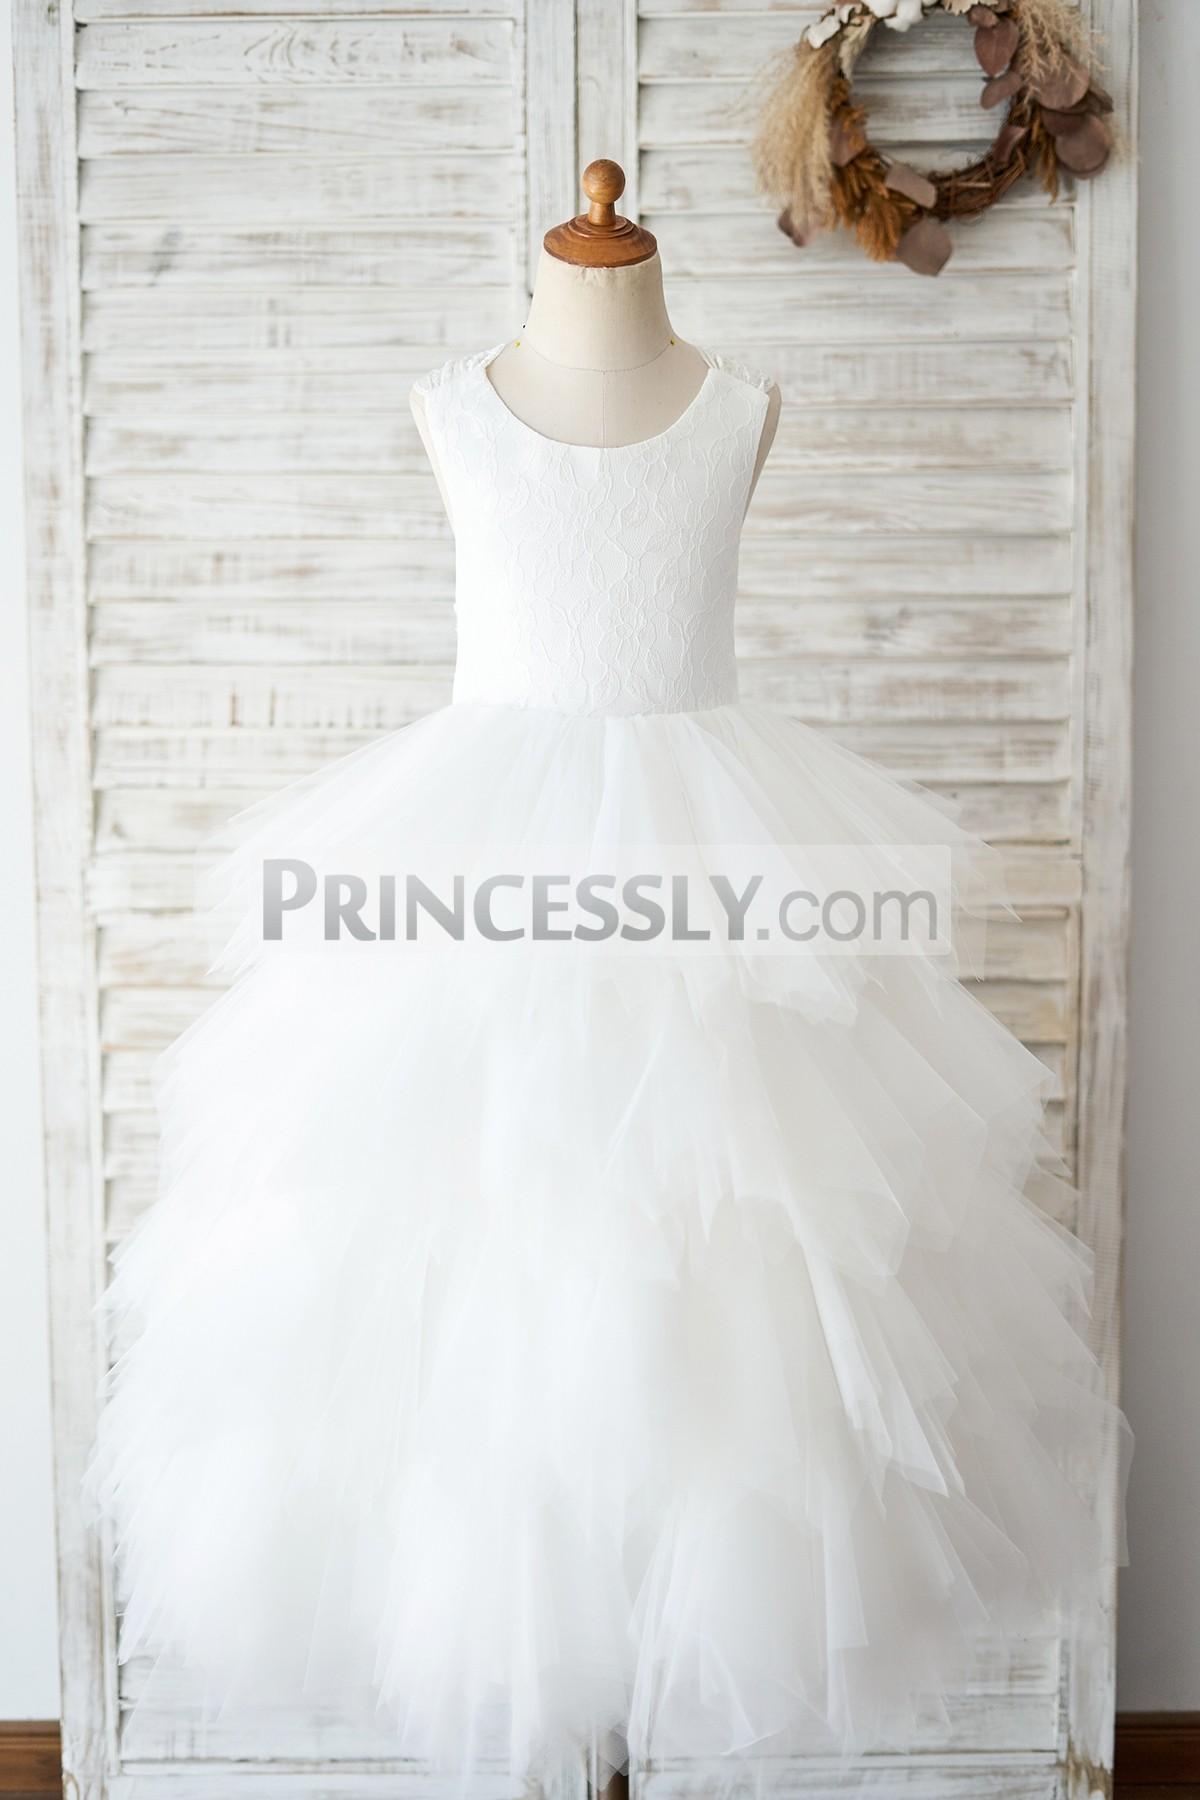 Princessly.com-K1004032-Backless Ivory Lace Ruffle Tulle Wedding Flower Girl Dress-31